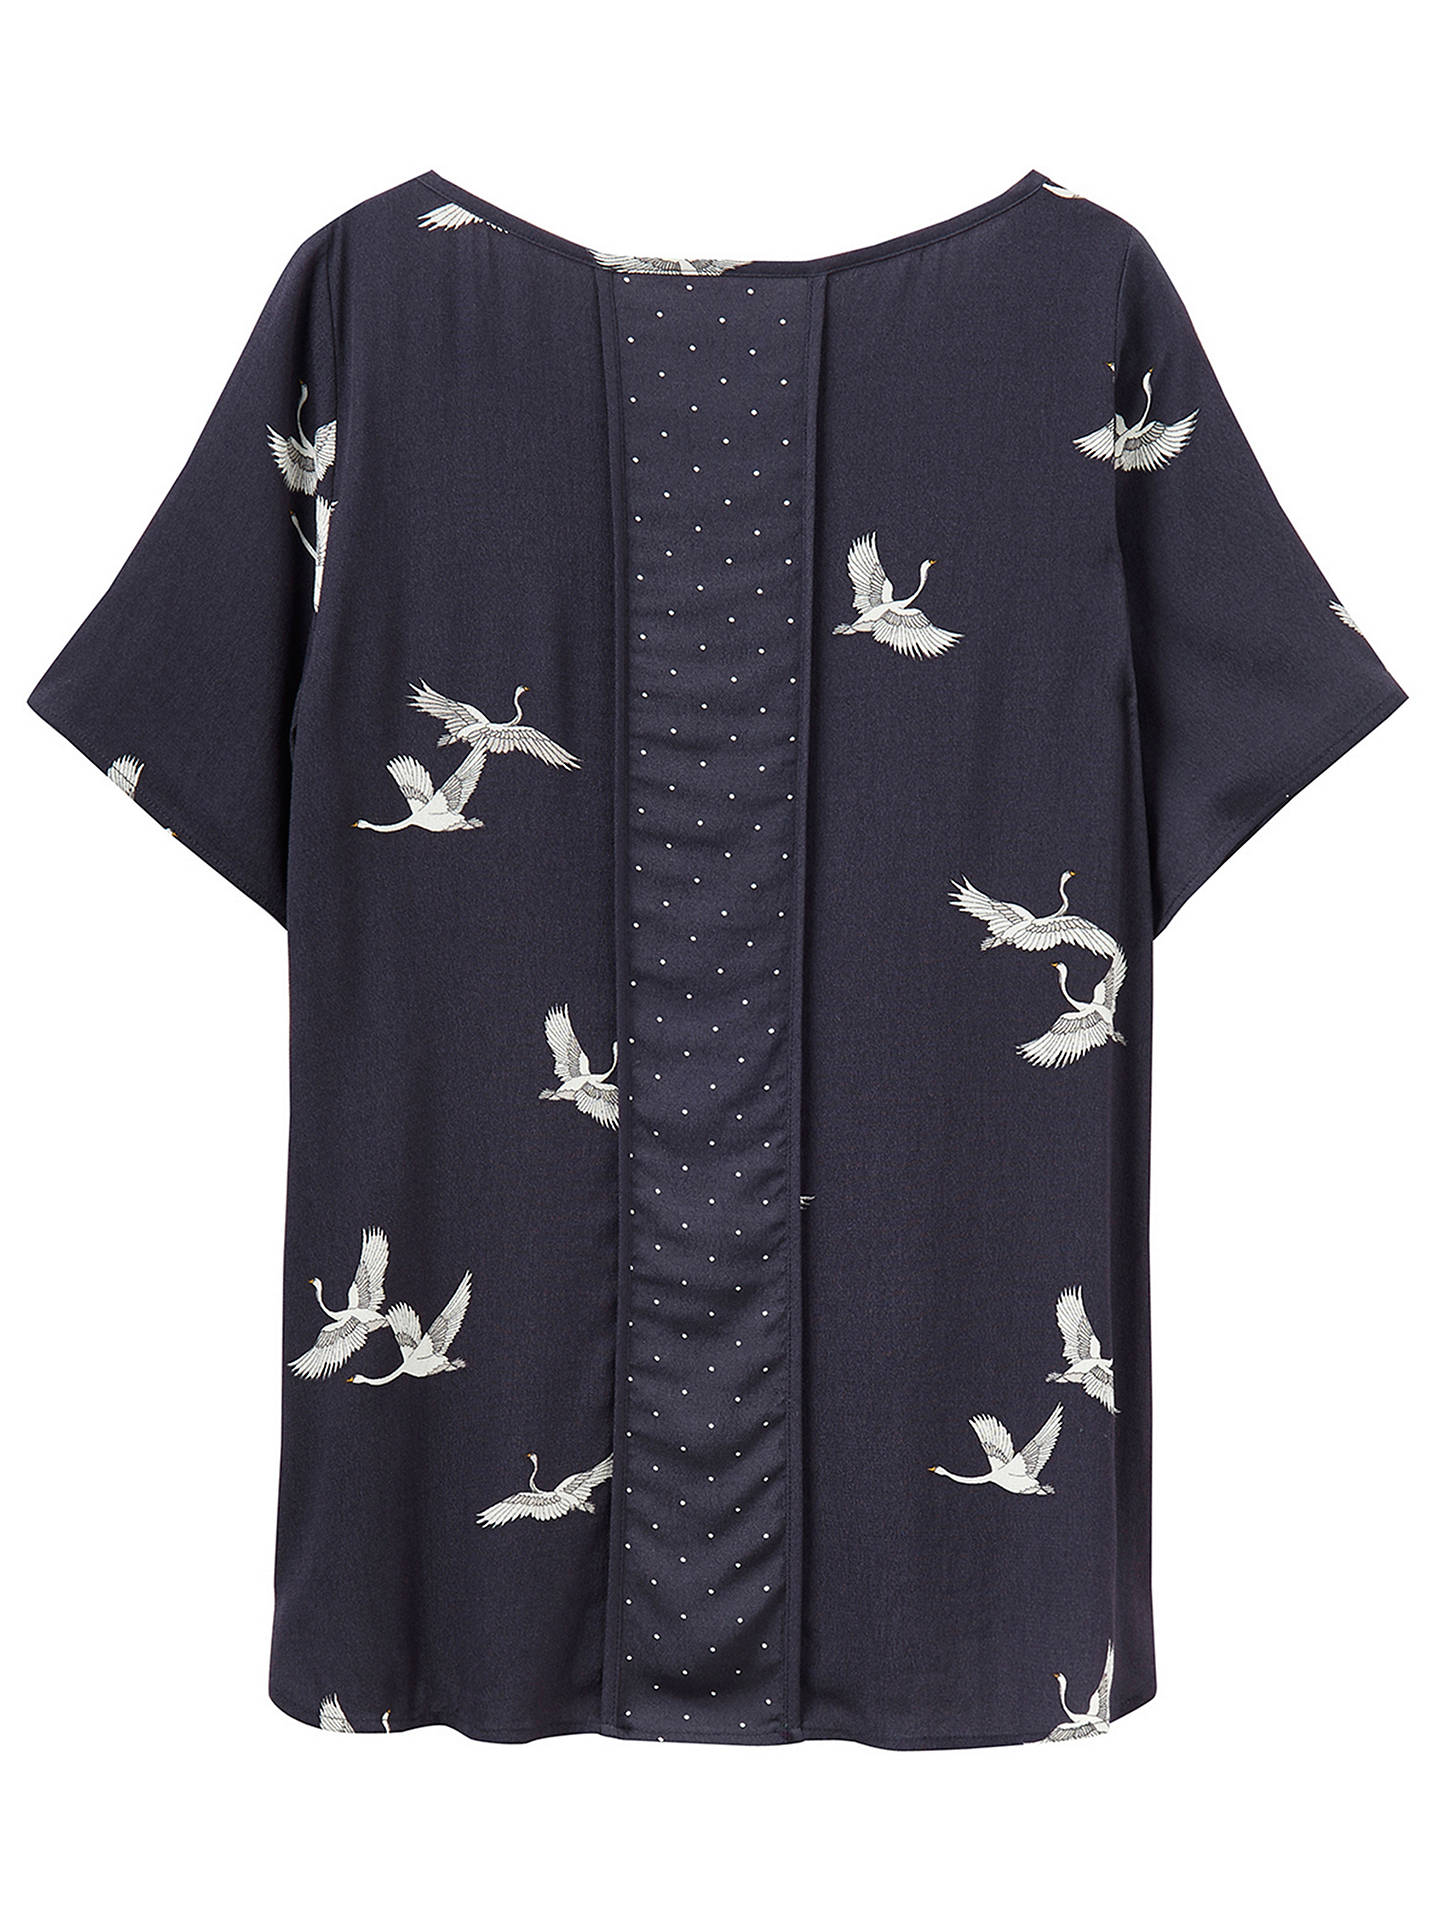 d504d59c379 Joules Hannah Swan Print Top, Grey Swans at John Lewis & Partners